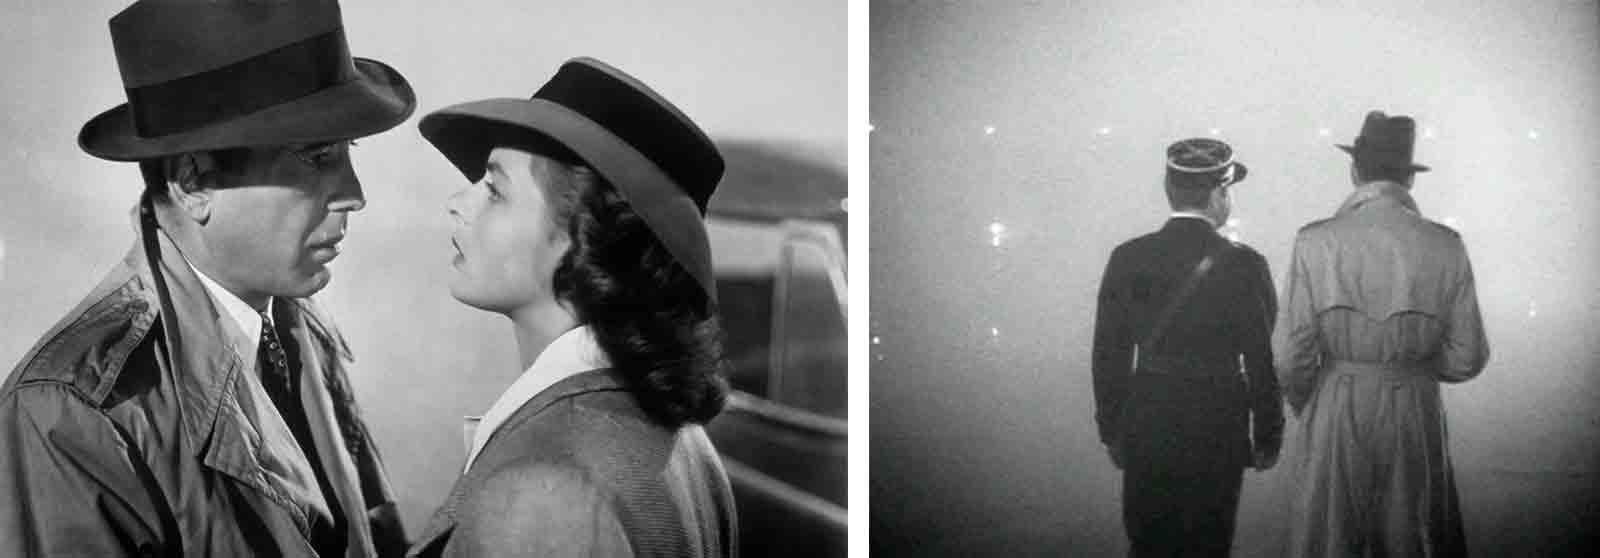 Casablanca, Michael Curtiz (1942)